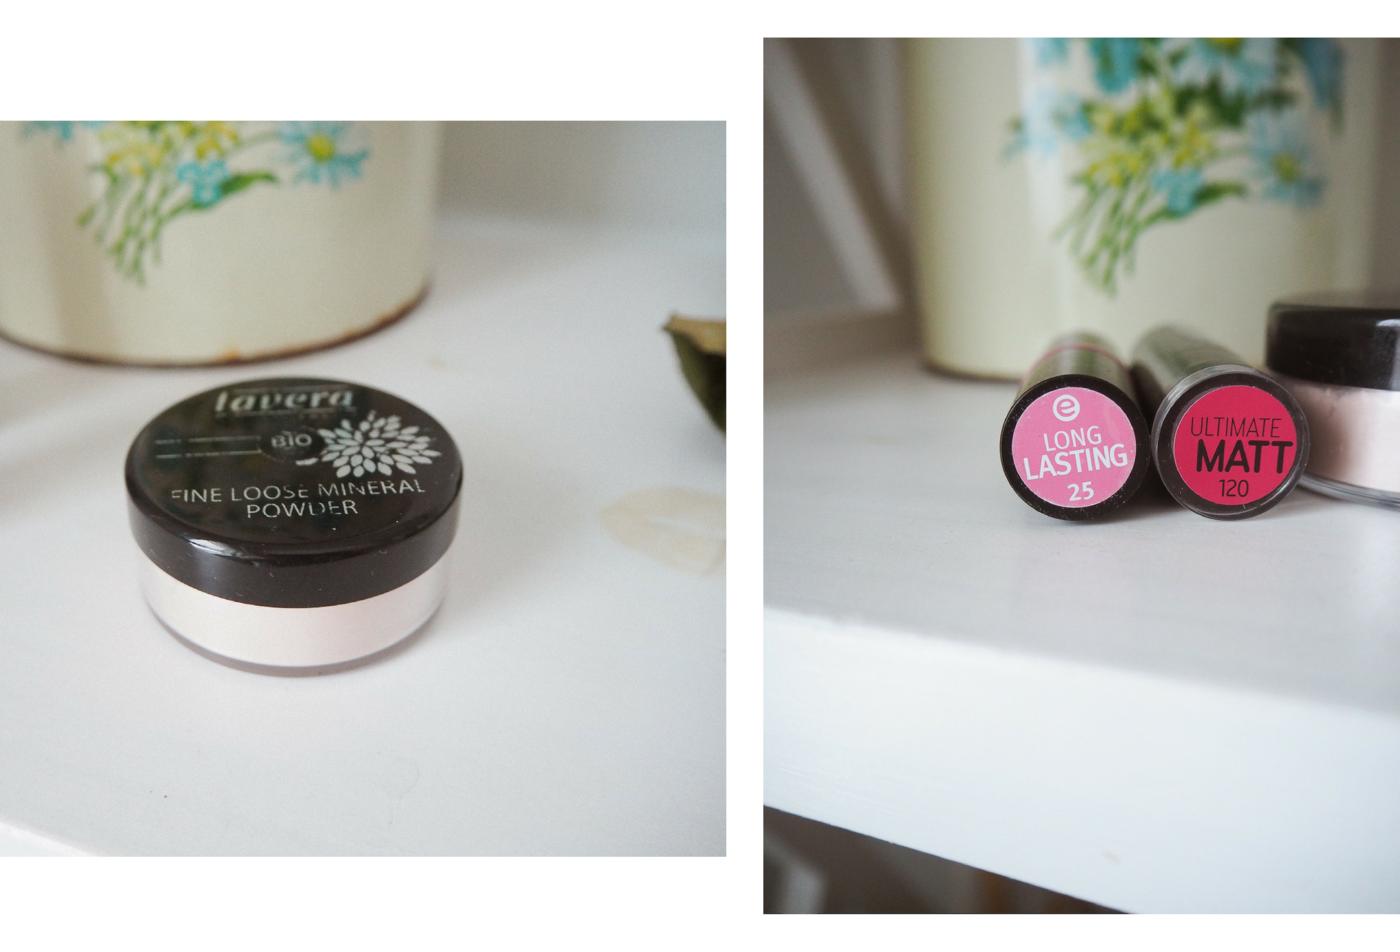 kosmetiikkasuosikit-lavera-puuteri-essence ja catrice-huulipunat.png